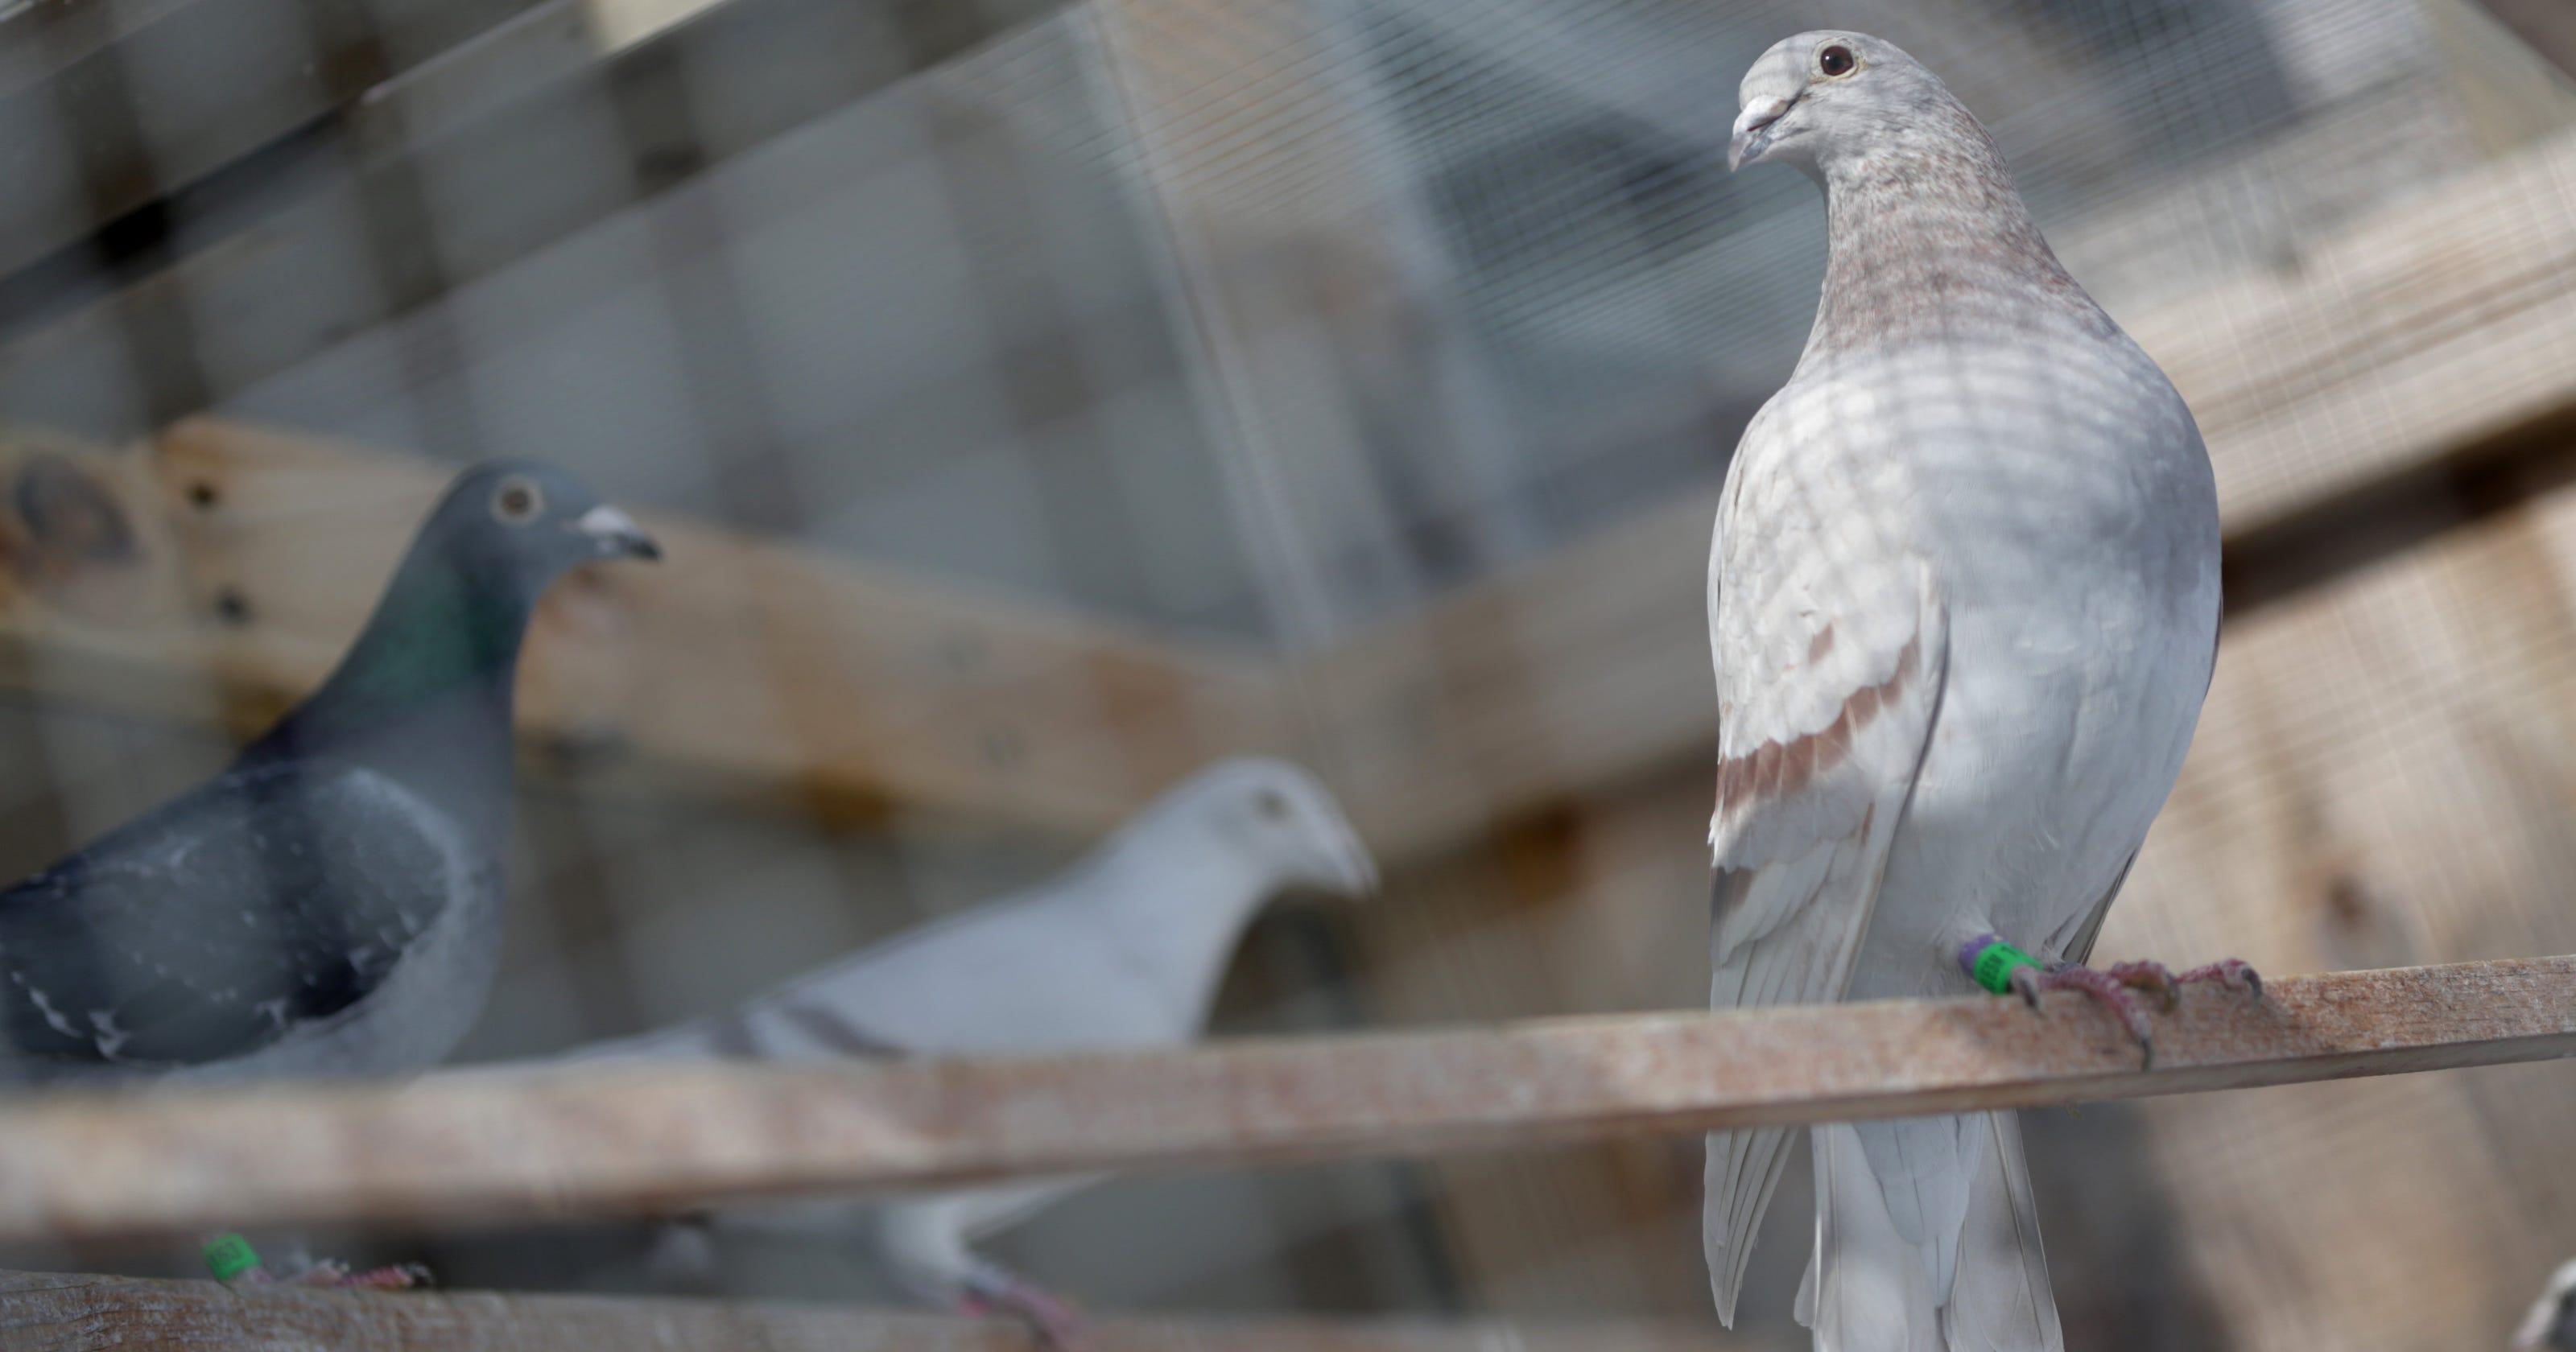 Homing pigeon dispute has feathers flying